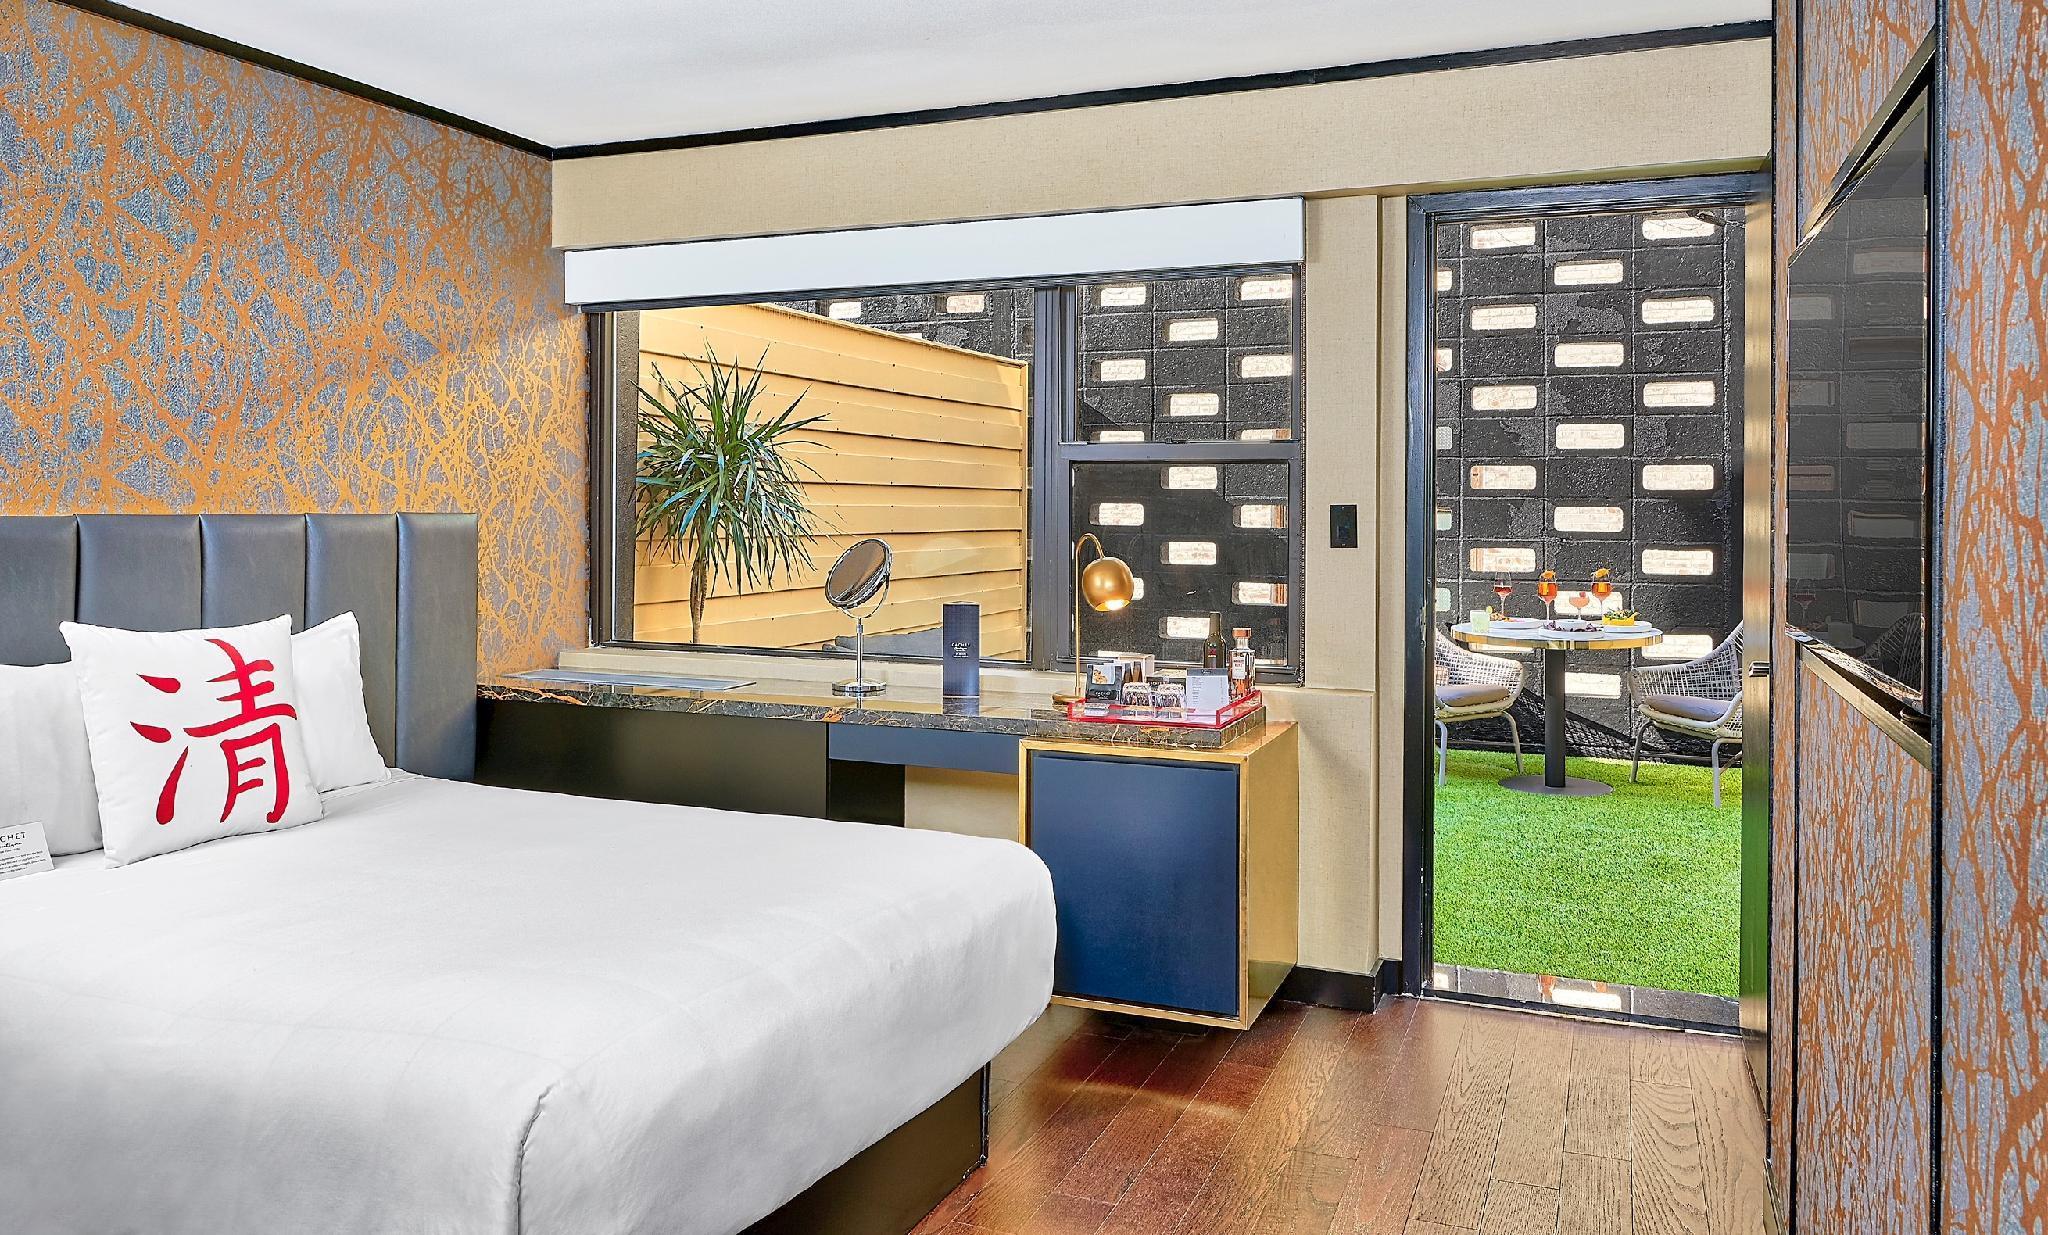 The Mela Hotel Nyc